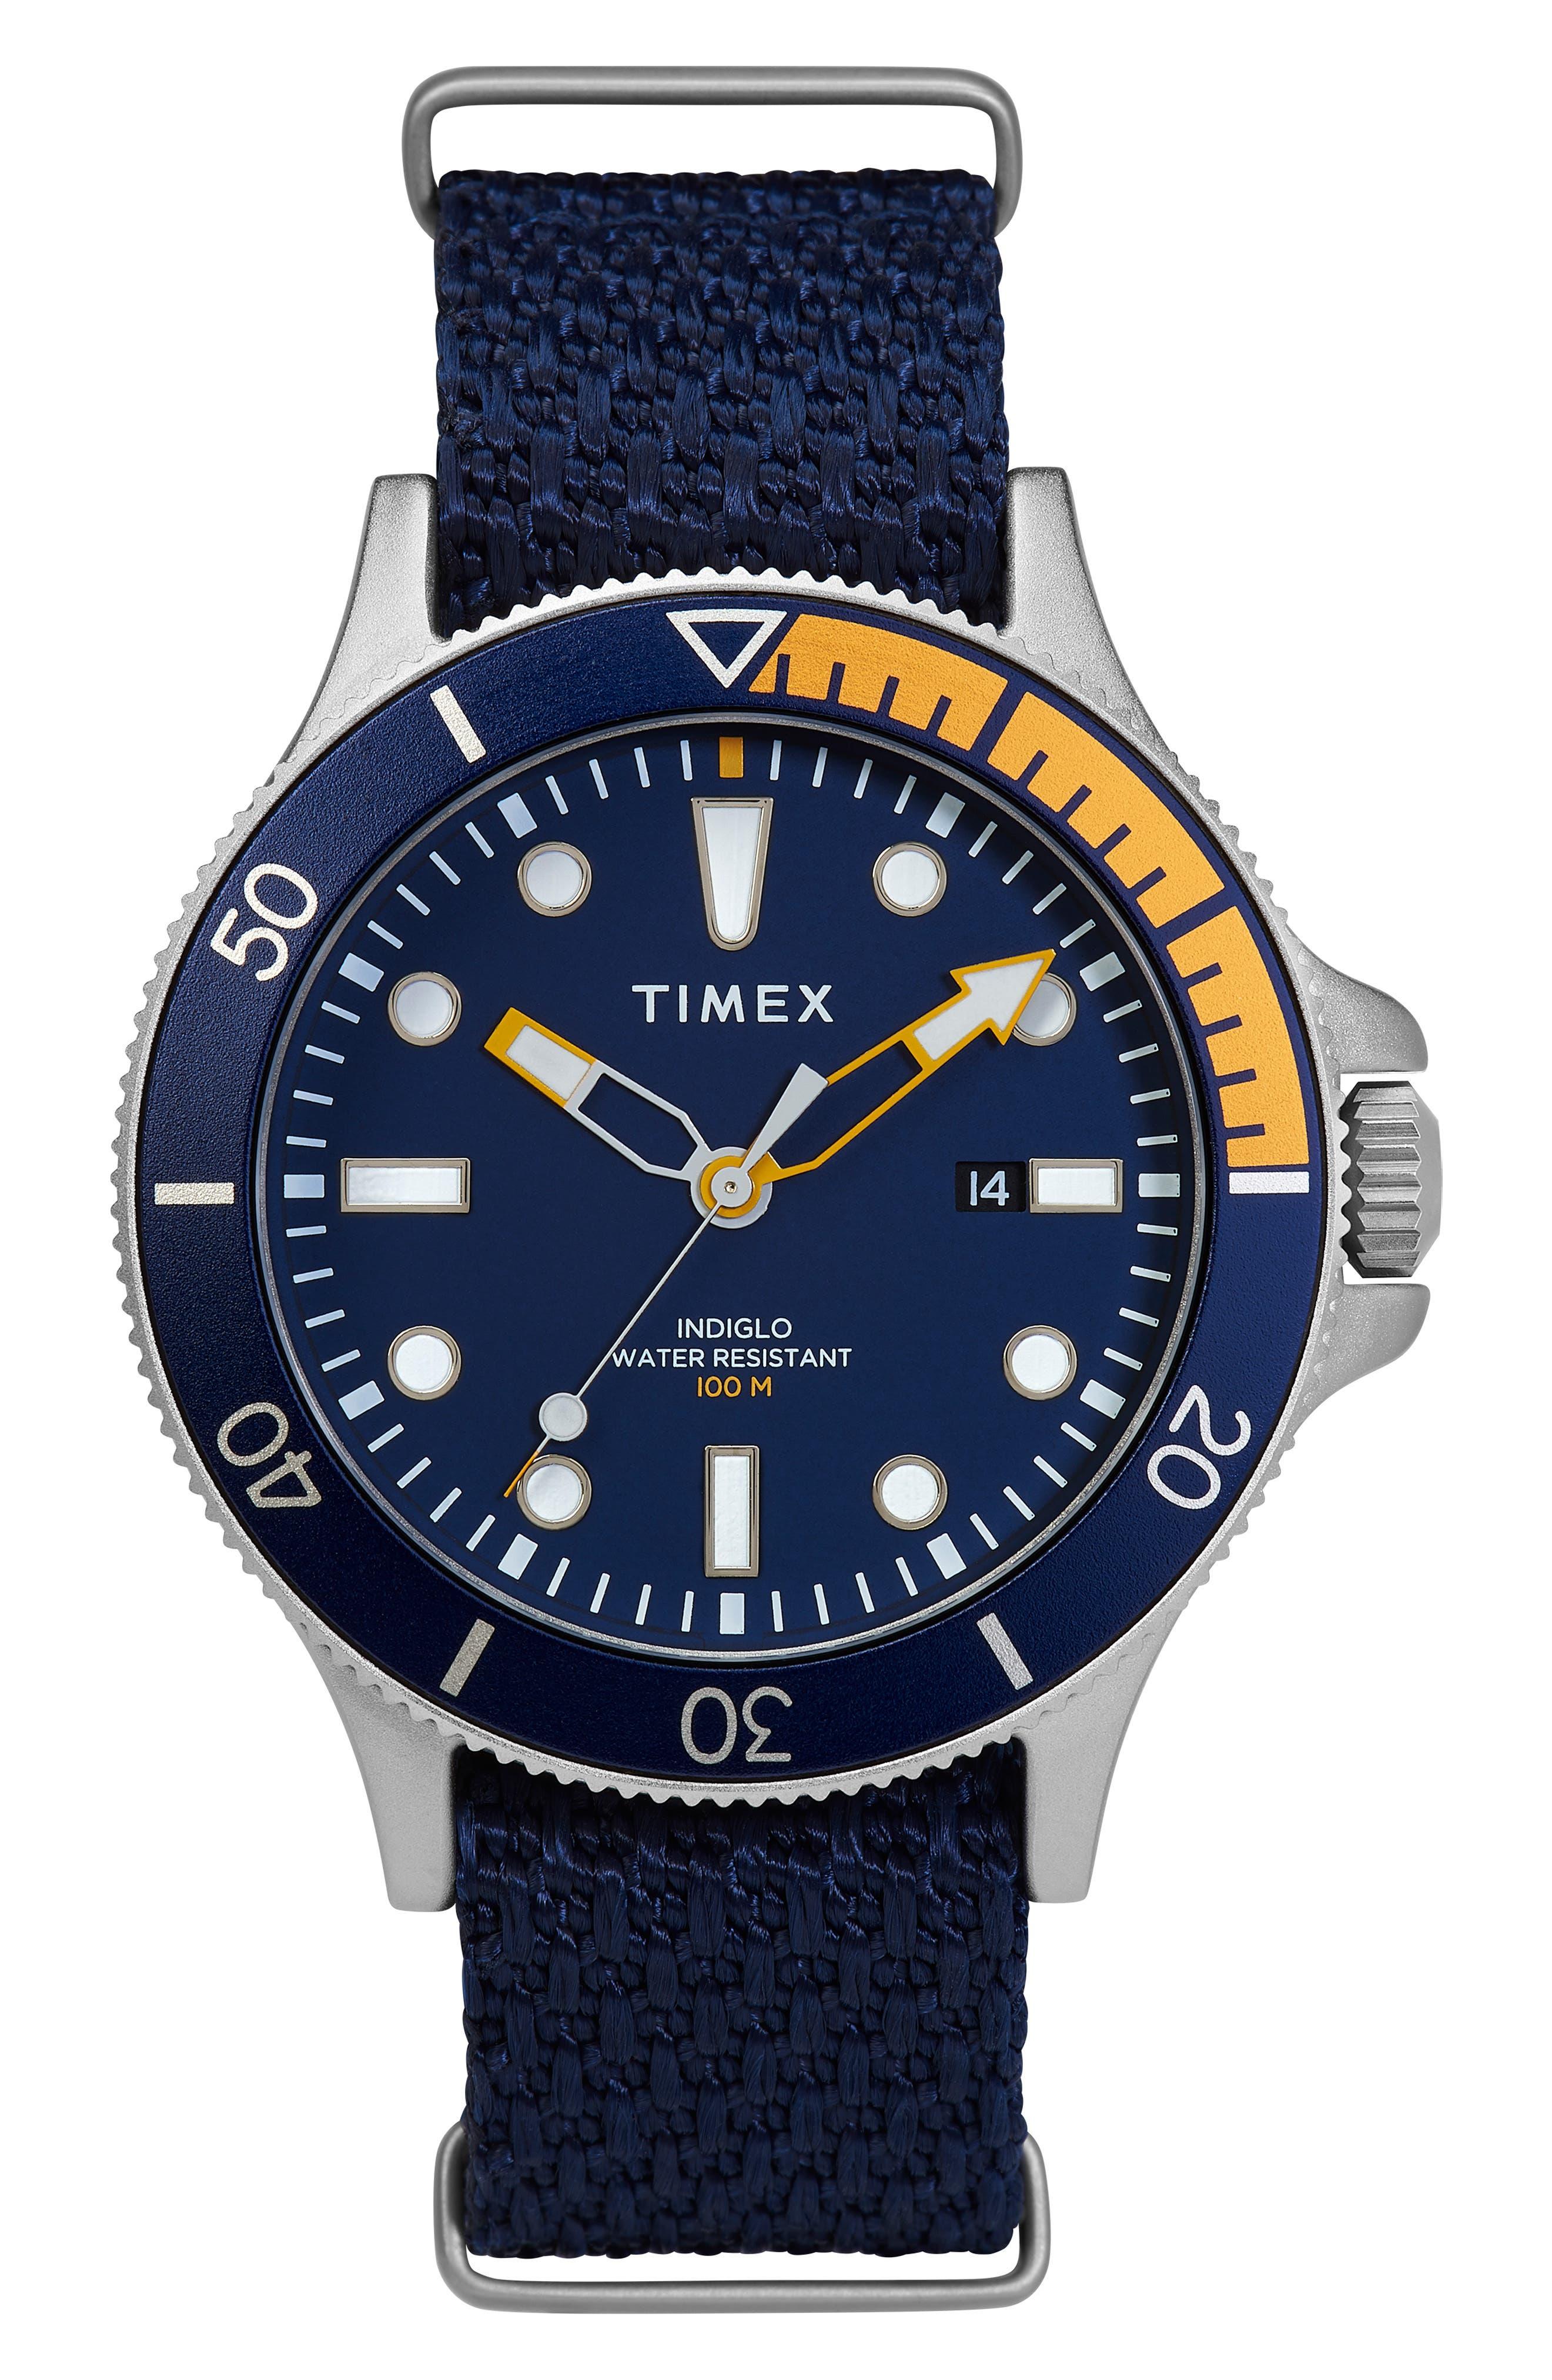 Timex Allied Woven Strap Watch, 4m